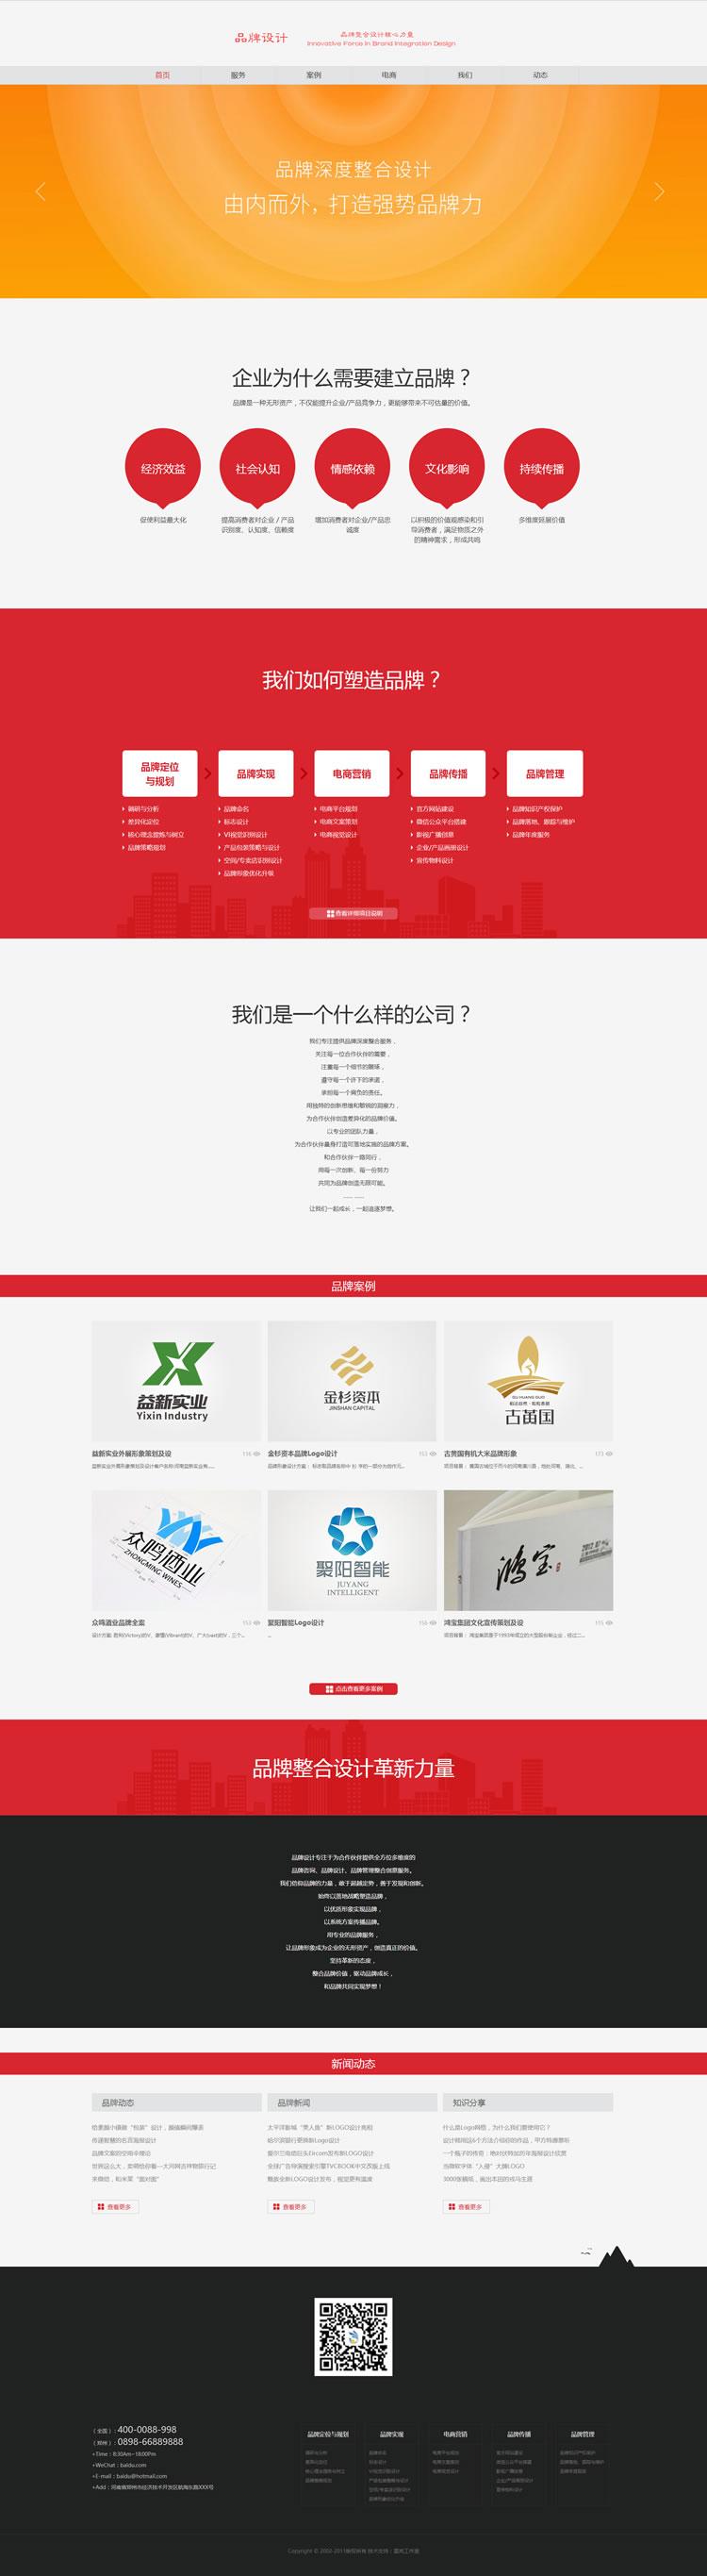 html5响应式手机自适应品牌设计类公司网站织梦模板.jpg